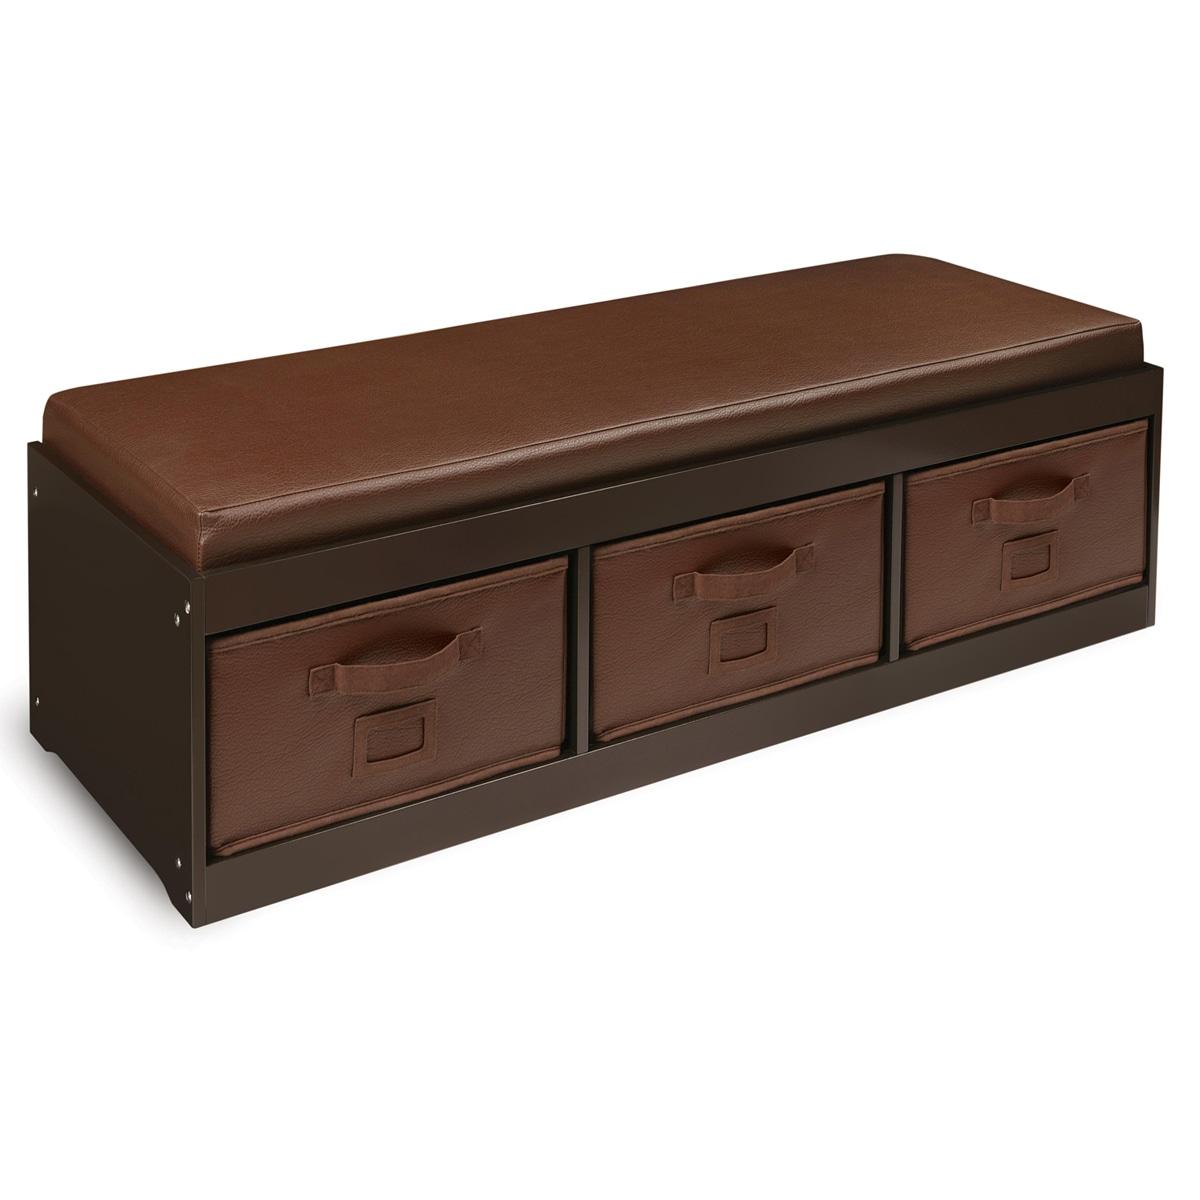 Shop Espresso Kid\'s Storage Bench with Espresso Bins - Free Shipping ...